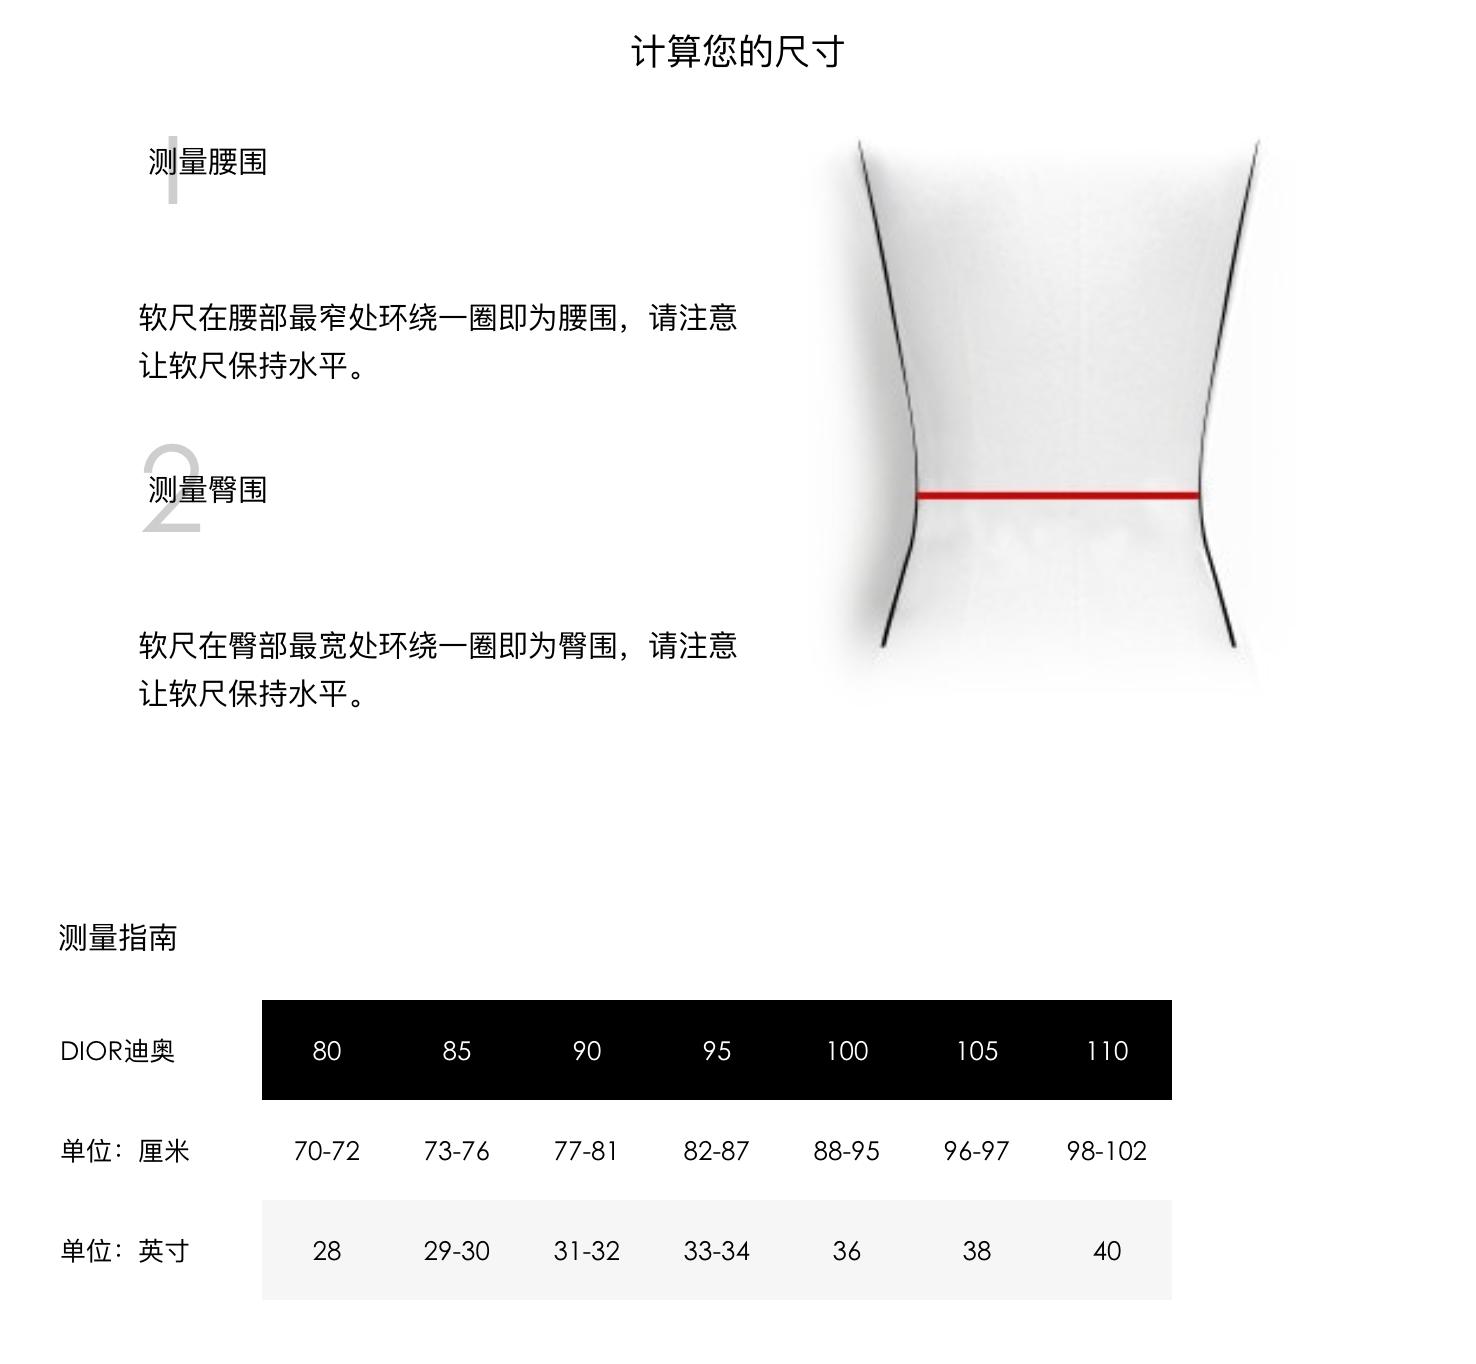 DIOR迪奥男士腰带测量说明